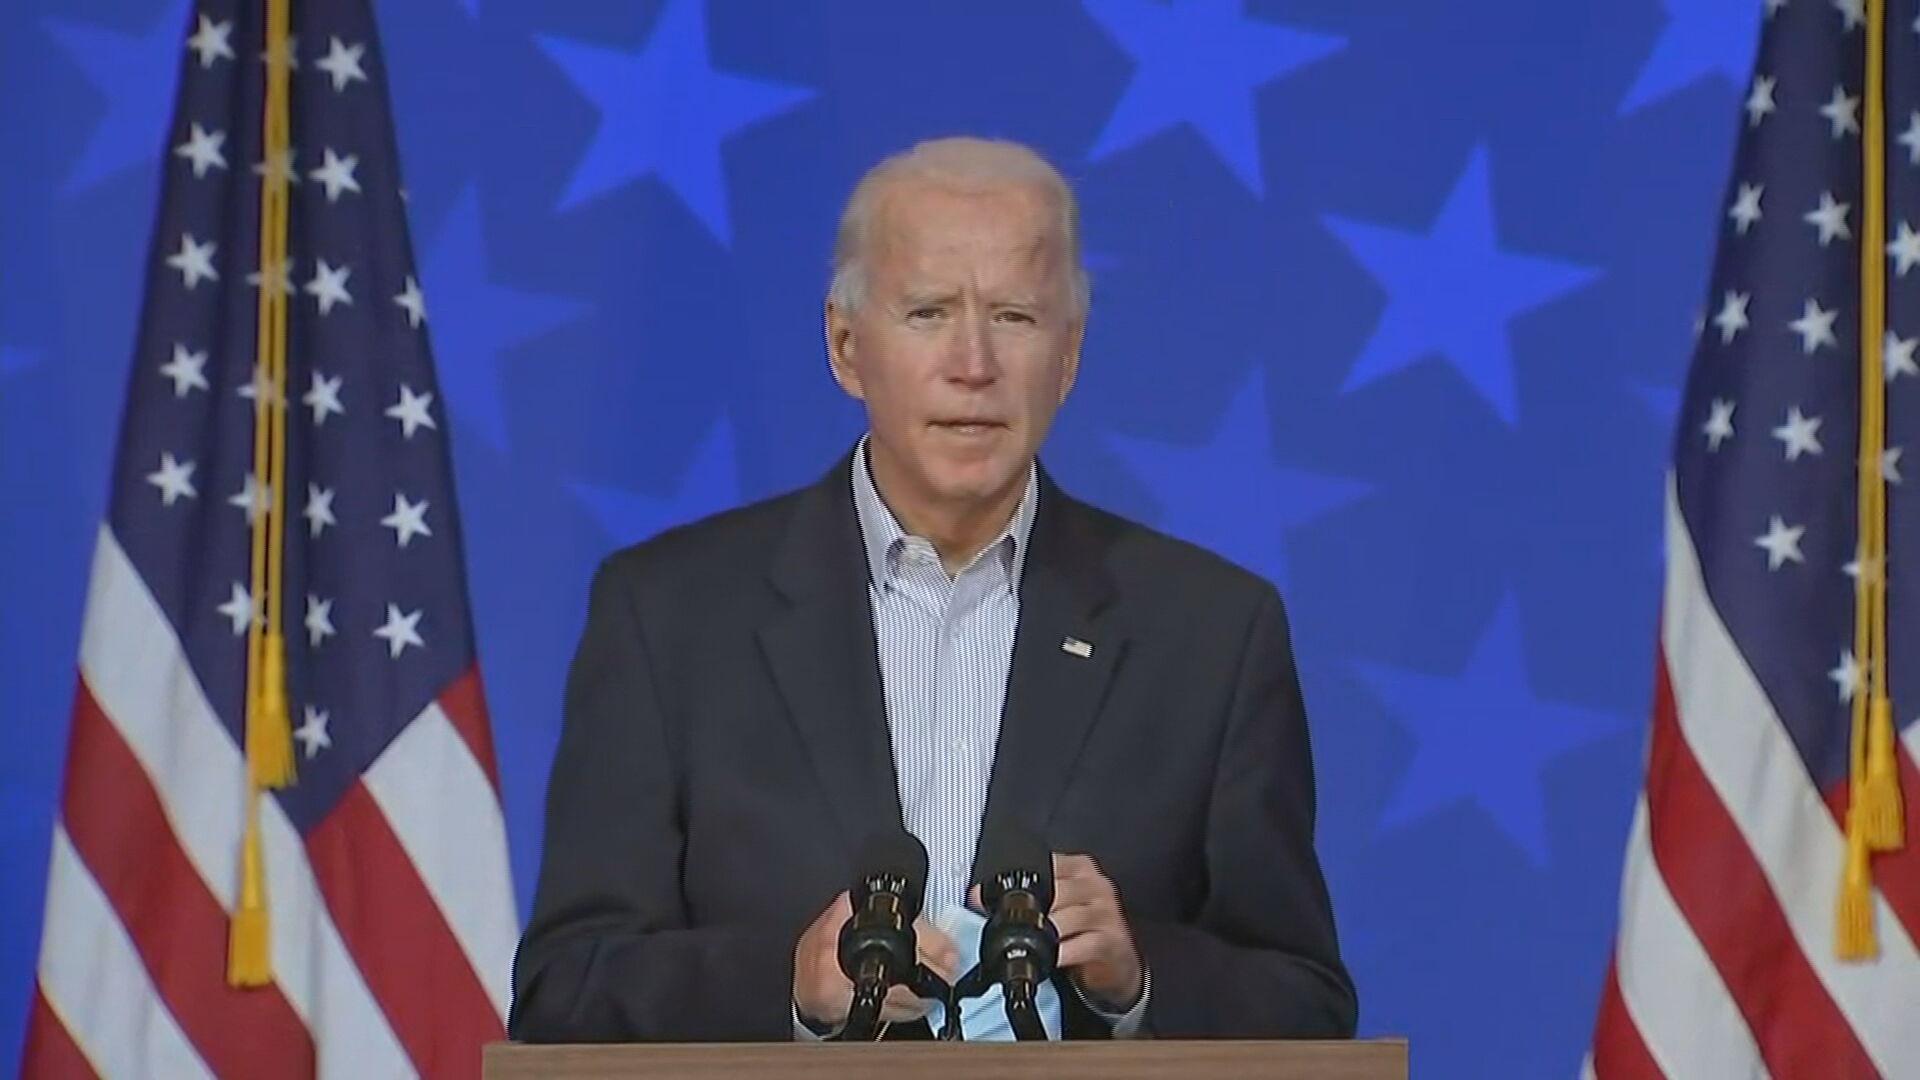 Biden-1 'Agora é hora de curar os EUA', diz Biden em 1º discurso como eleito